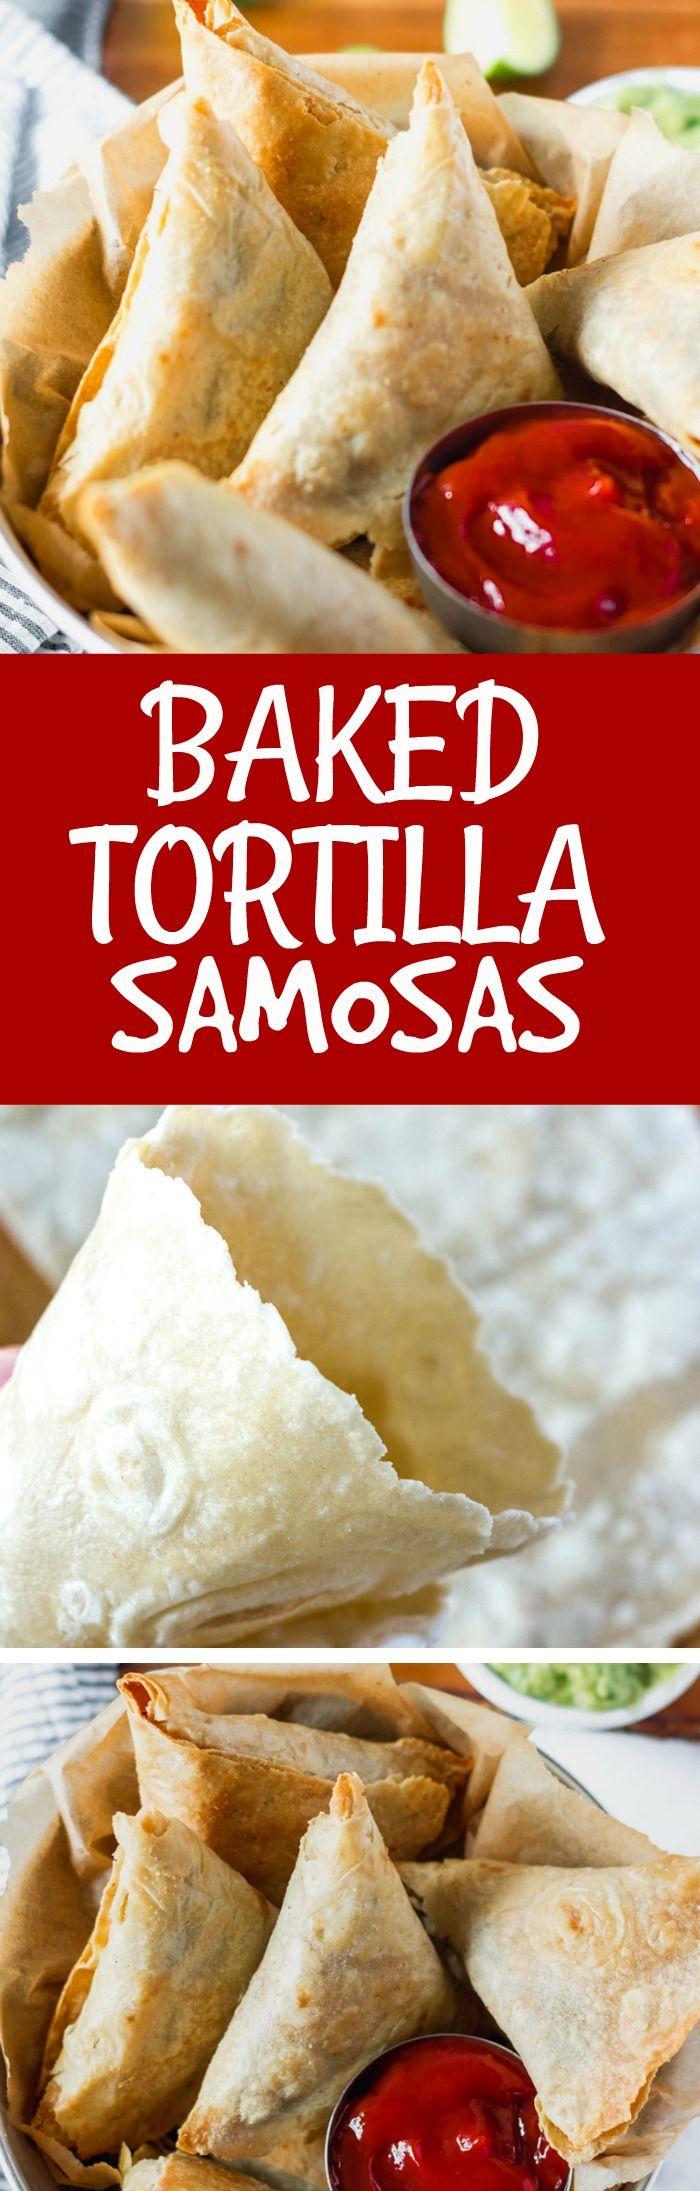 Baked Tortilla Samosas Vegan, Gluten-Free #samosas #healthiersteps #streetfood #veganrecipes #veganlife